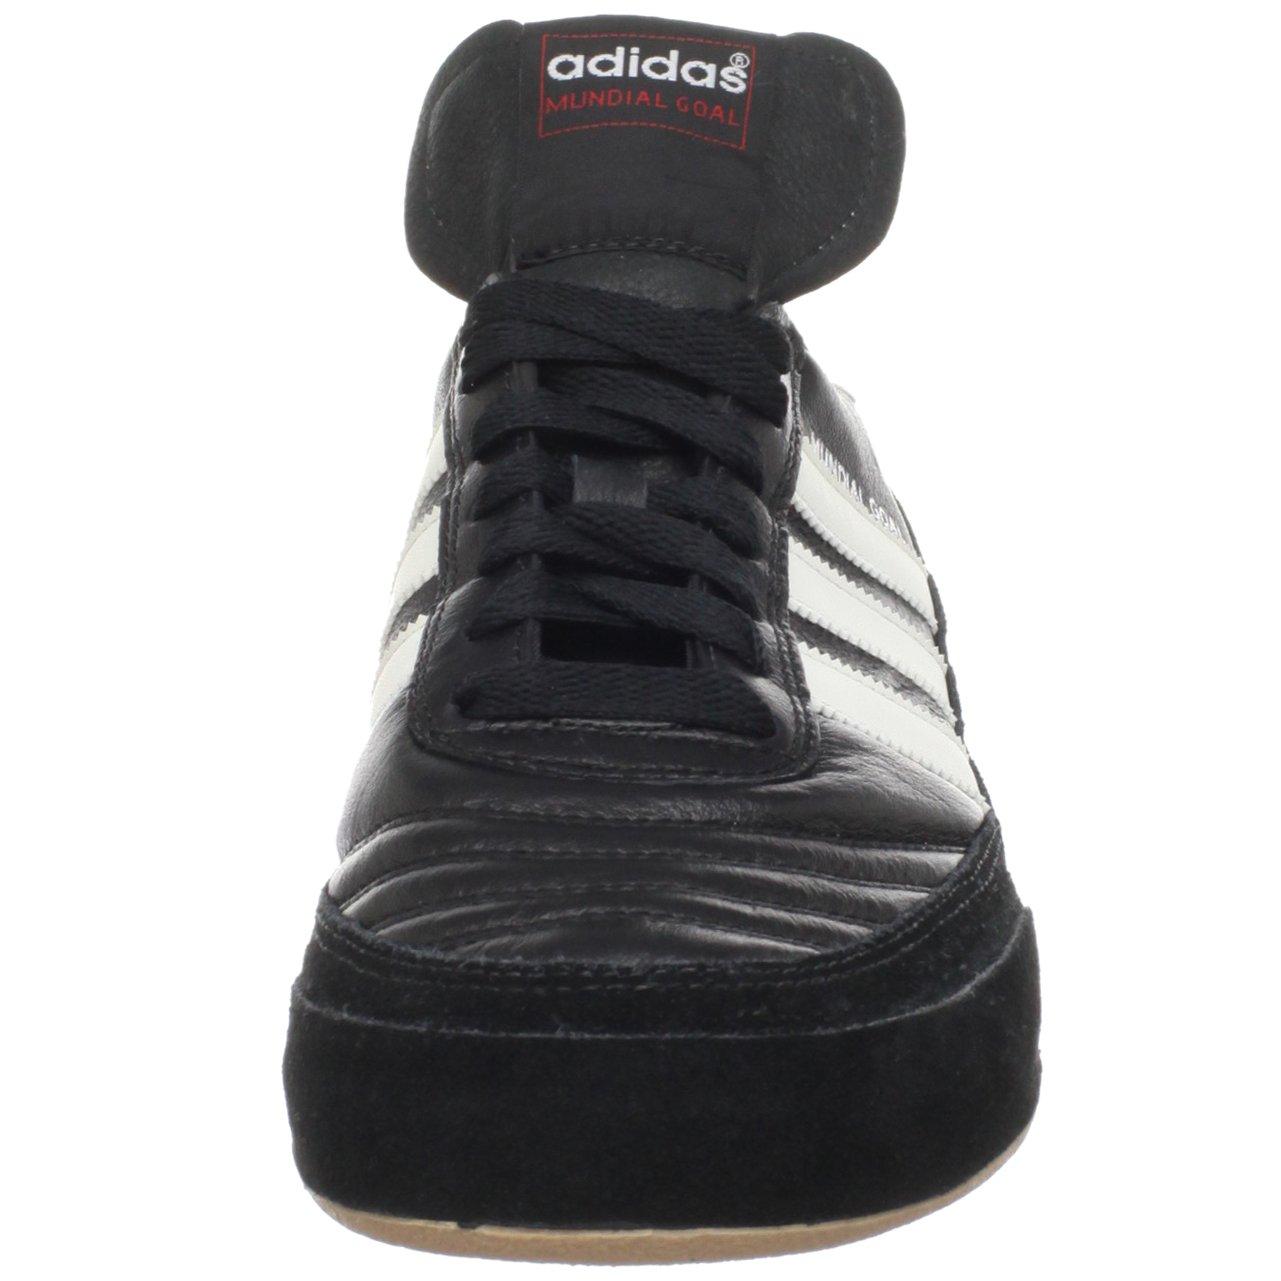 adidas Men's Mundial Goal Soccer Cleat, Black/White/White, 5 M US by adidas (Image #4)